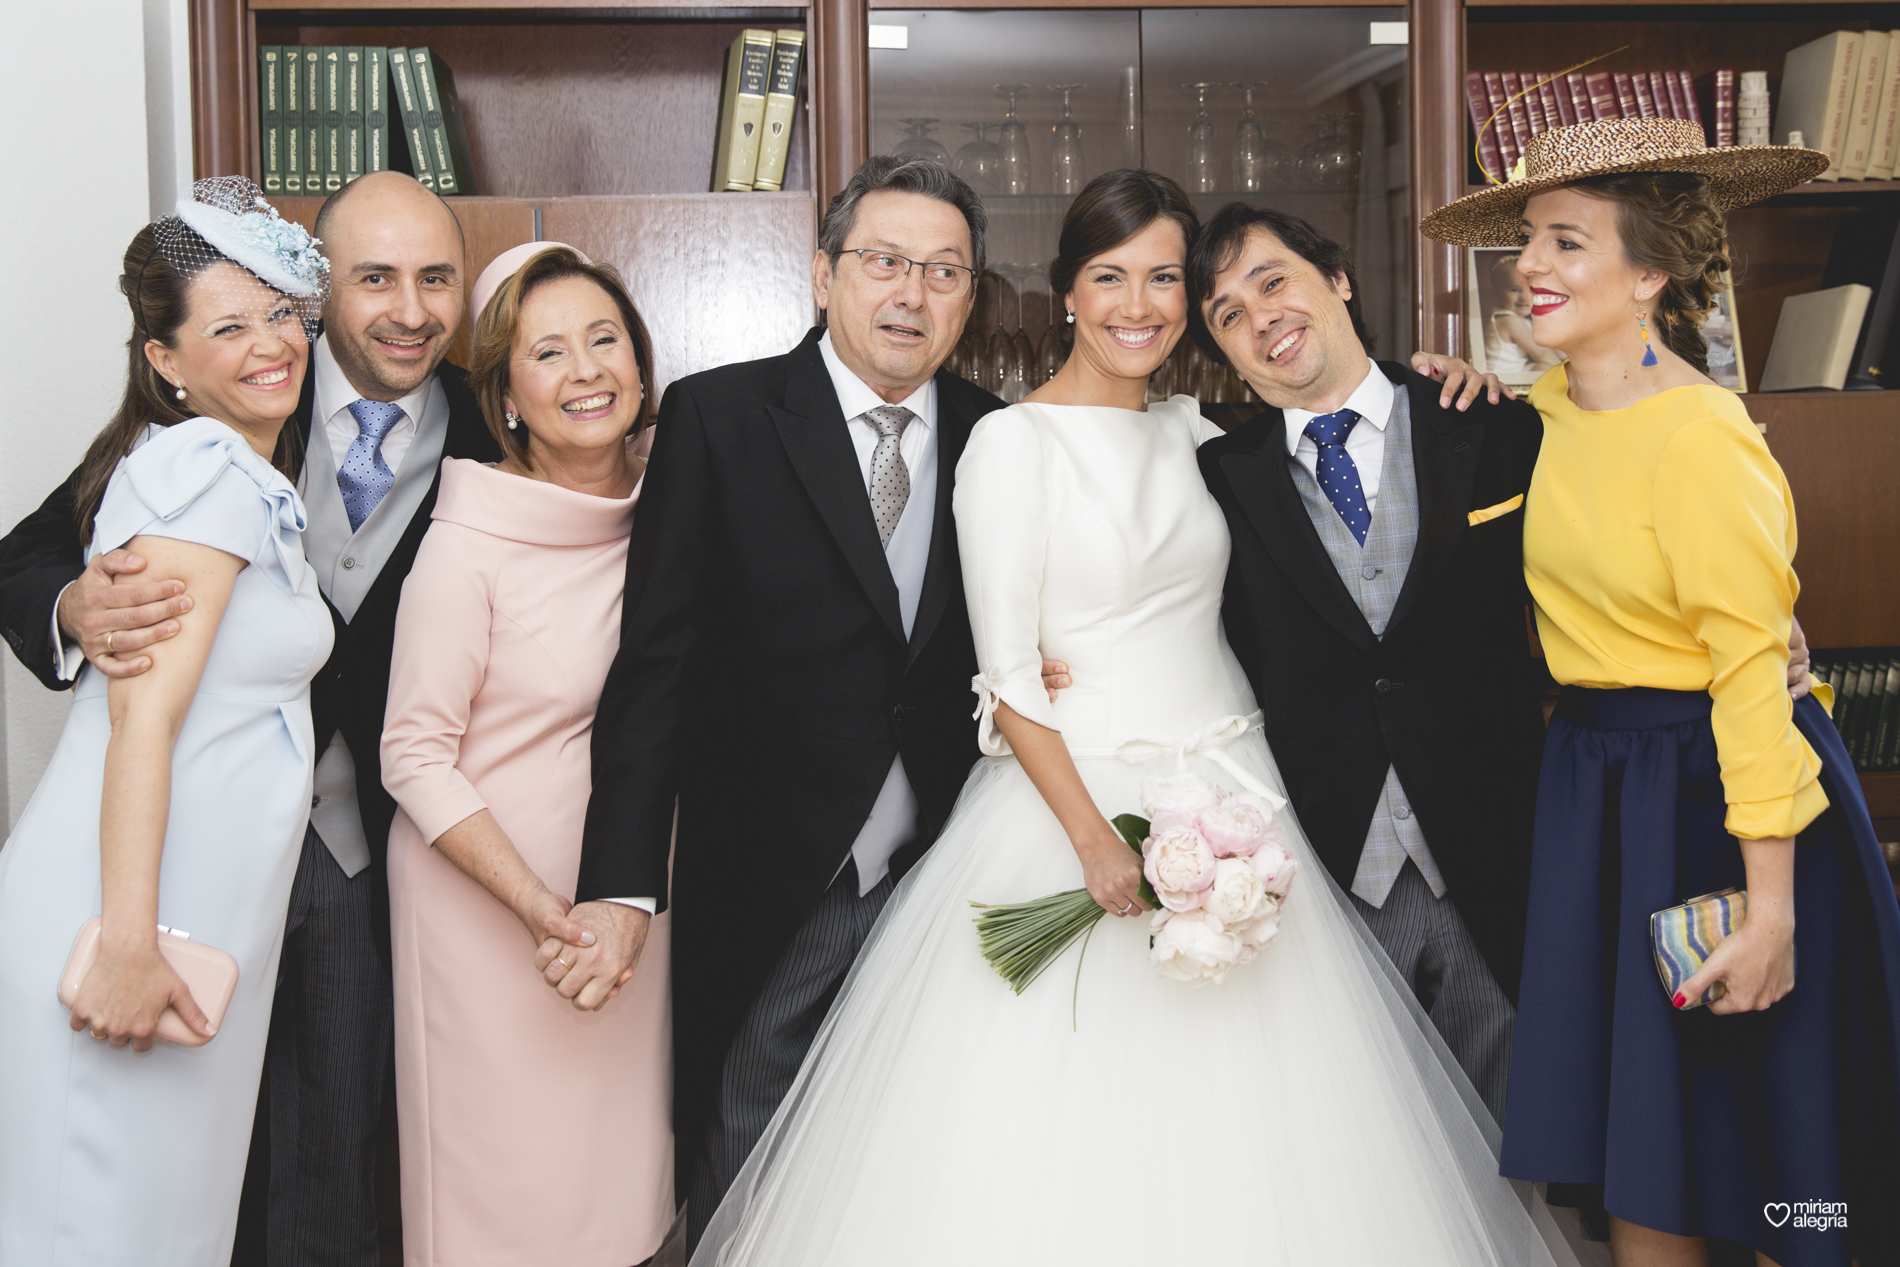 boda-en-la-catedral-de-murcia-miriam-alegria-fotografos-boda-murcia-23